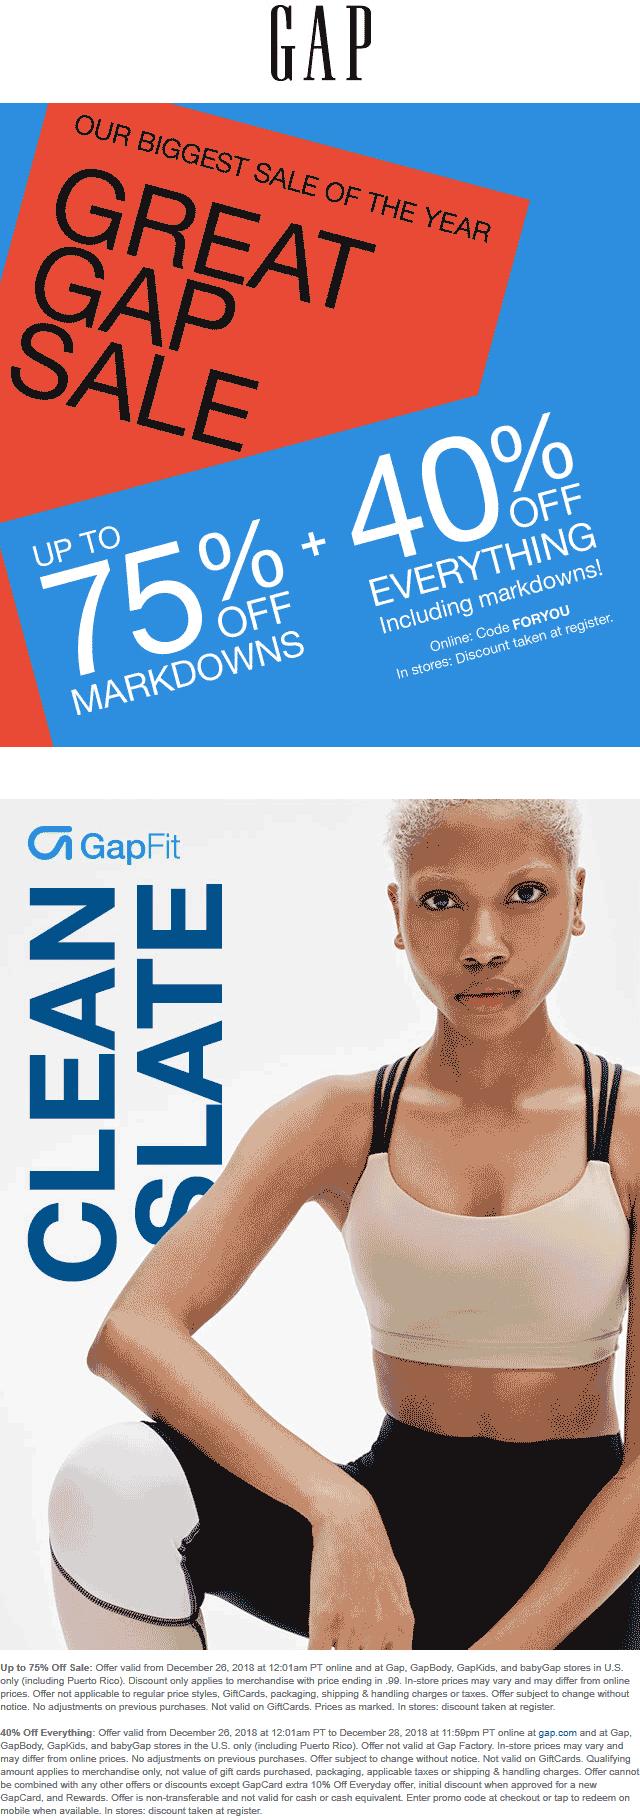 Gap coupons & promo code for [April 2020]